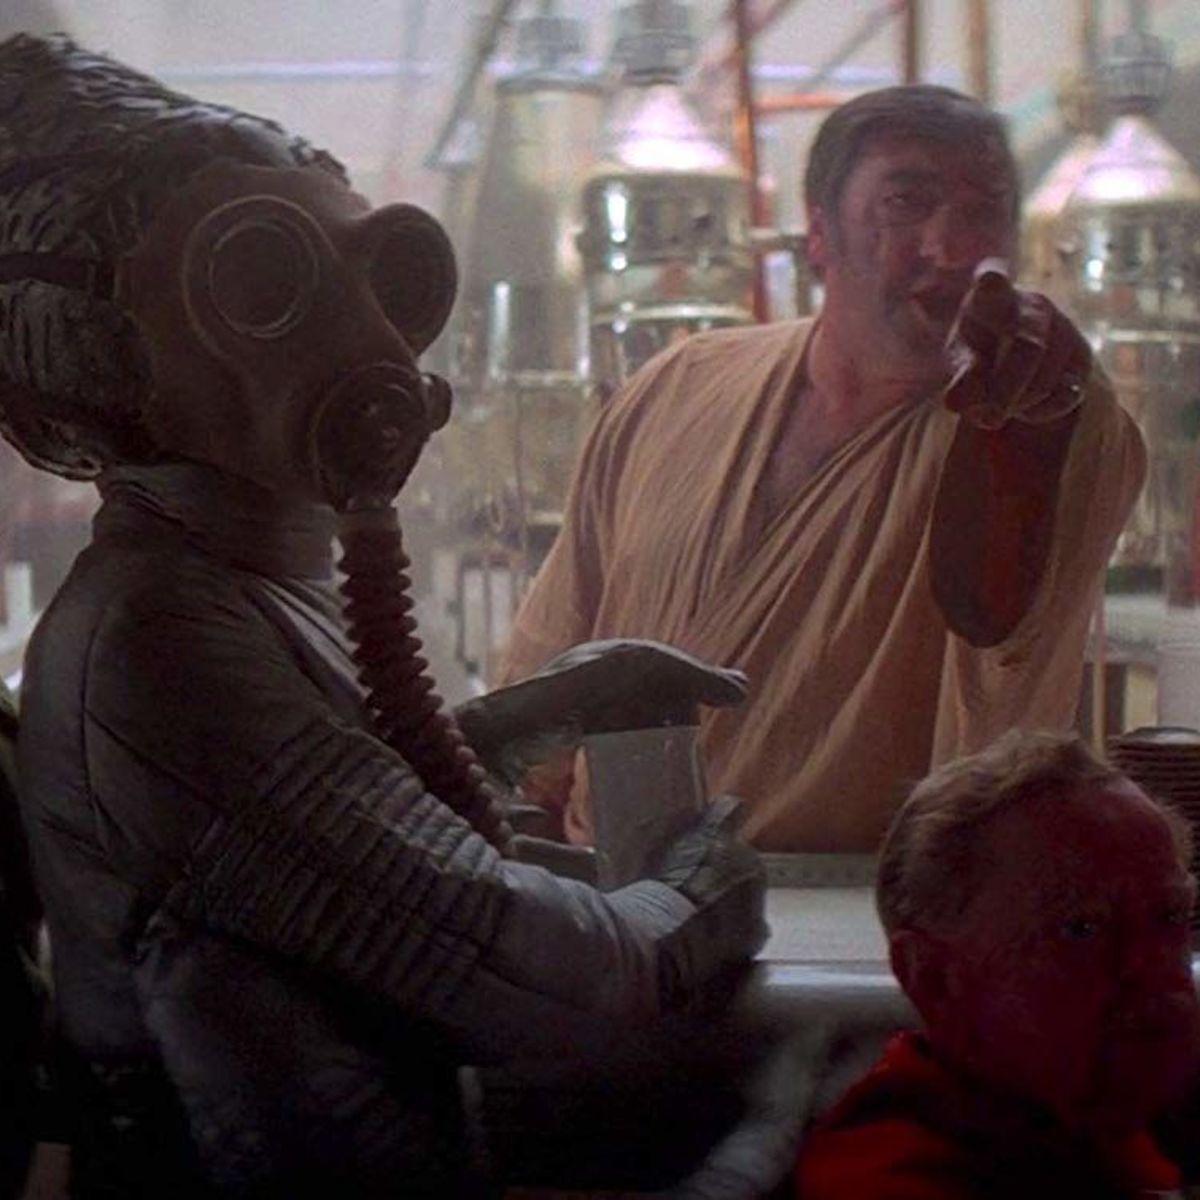 Star Wars Mos Eisley cantina A New Hope